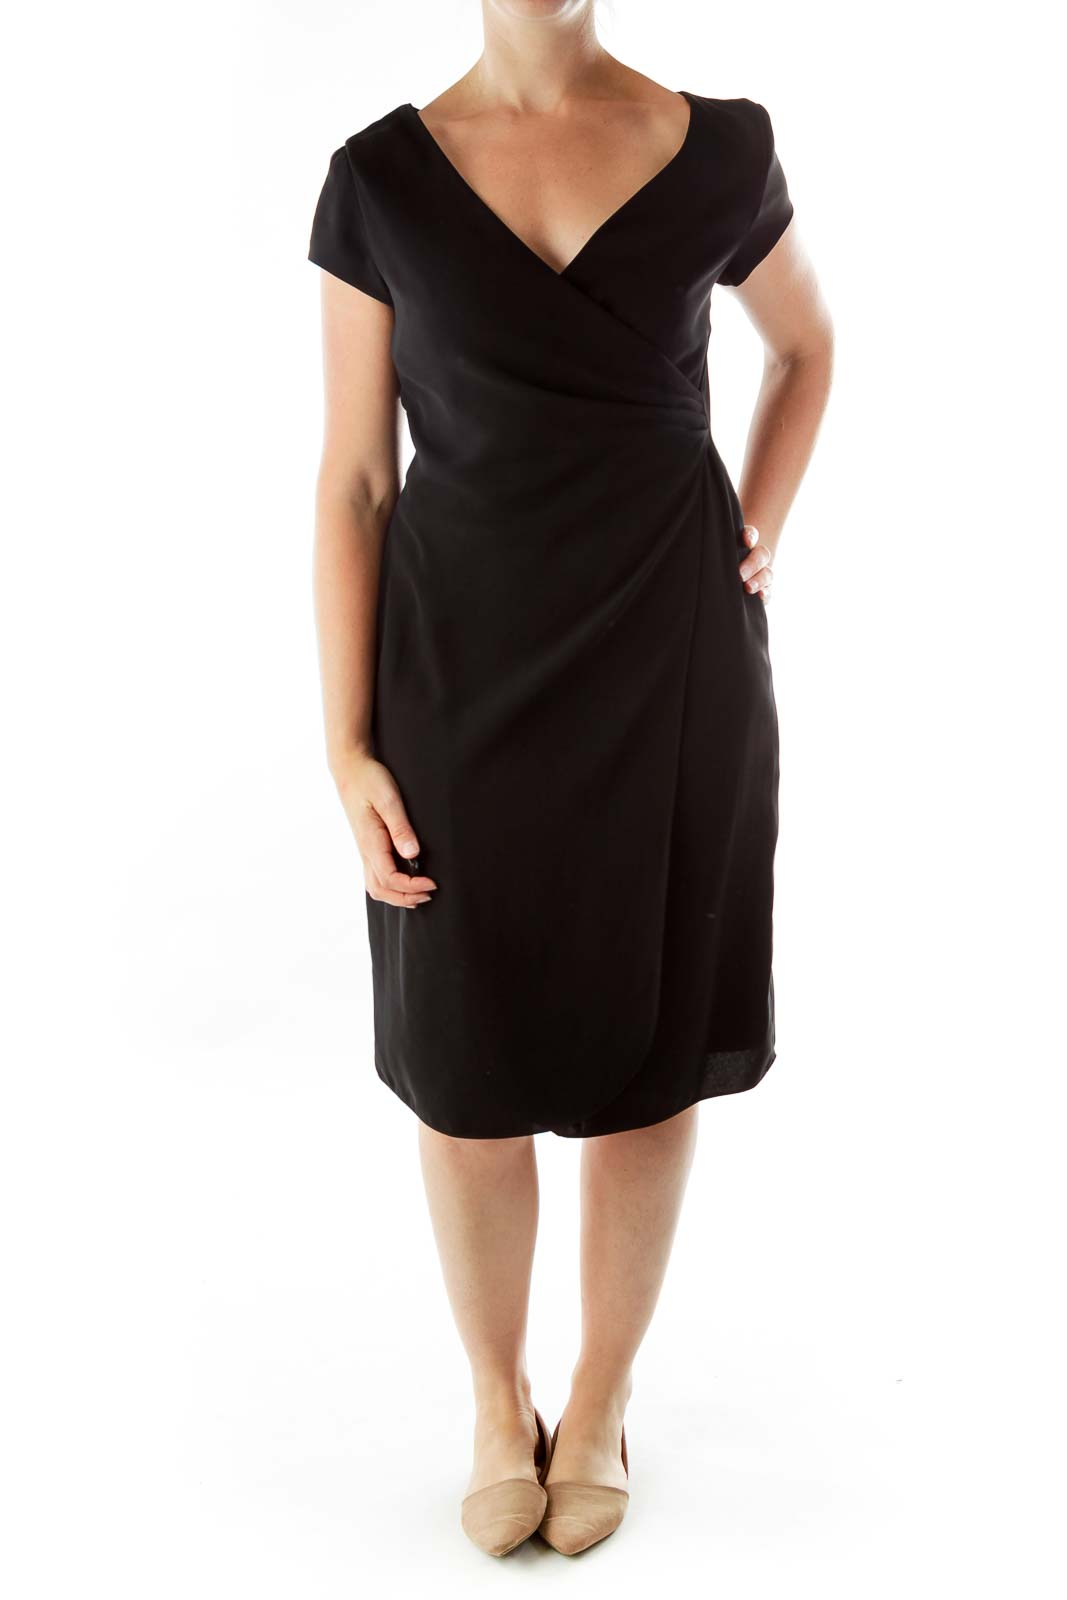 Black V-neck Fitted Dress